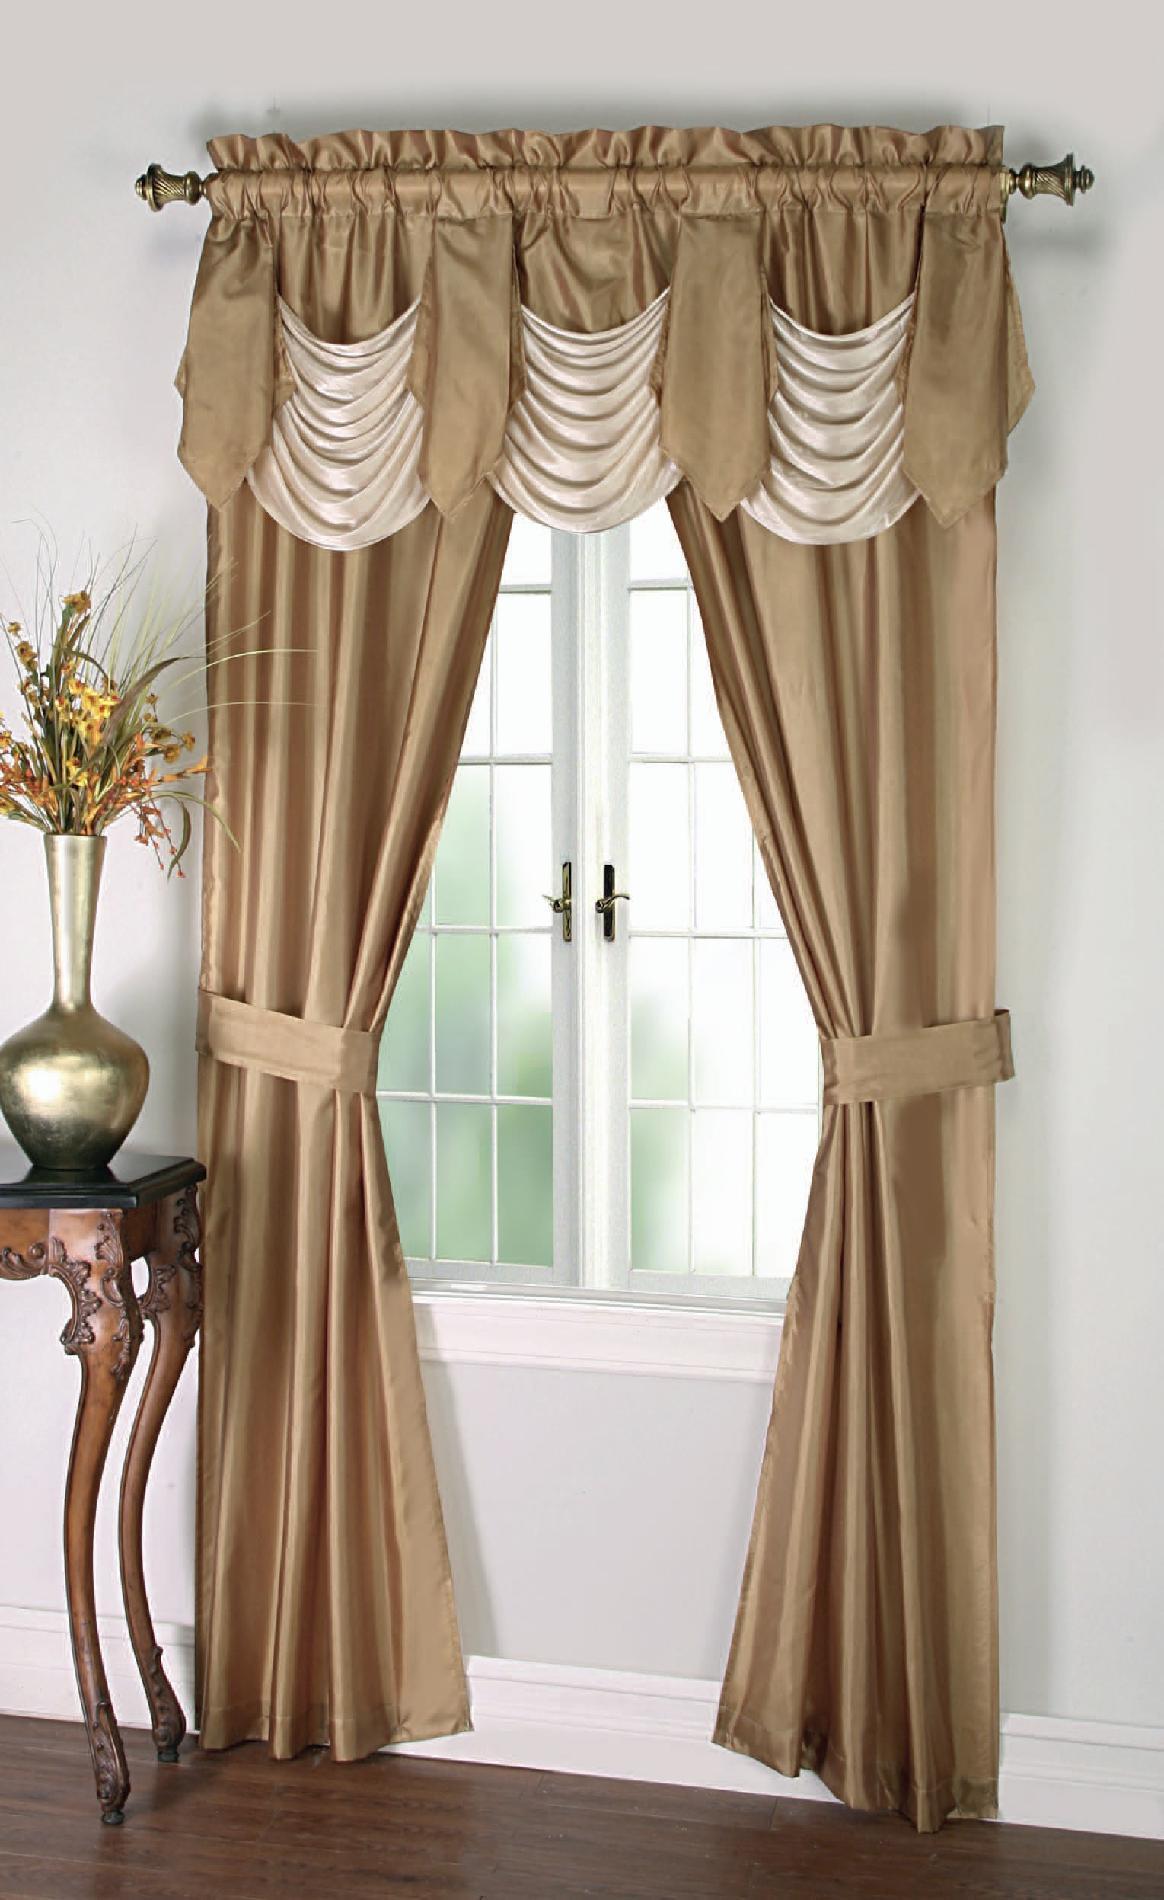 Beautiful Cannon 5 Piece Curtain Panels, Valance U0026 Tiebacks   Bellany Gallery